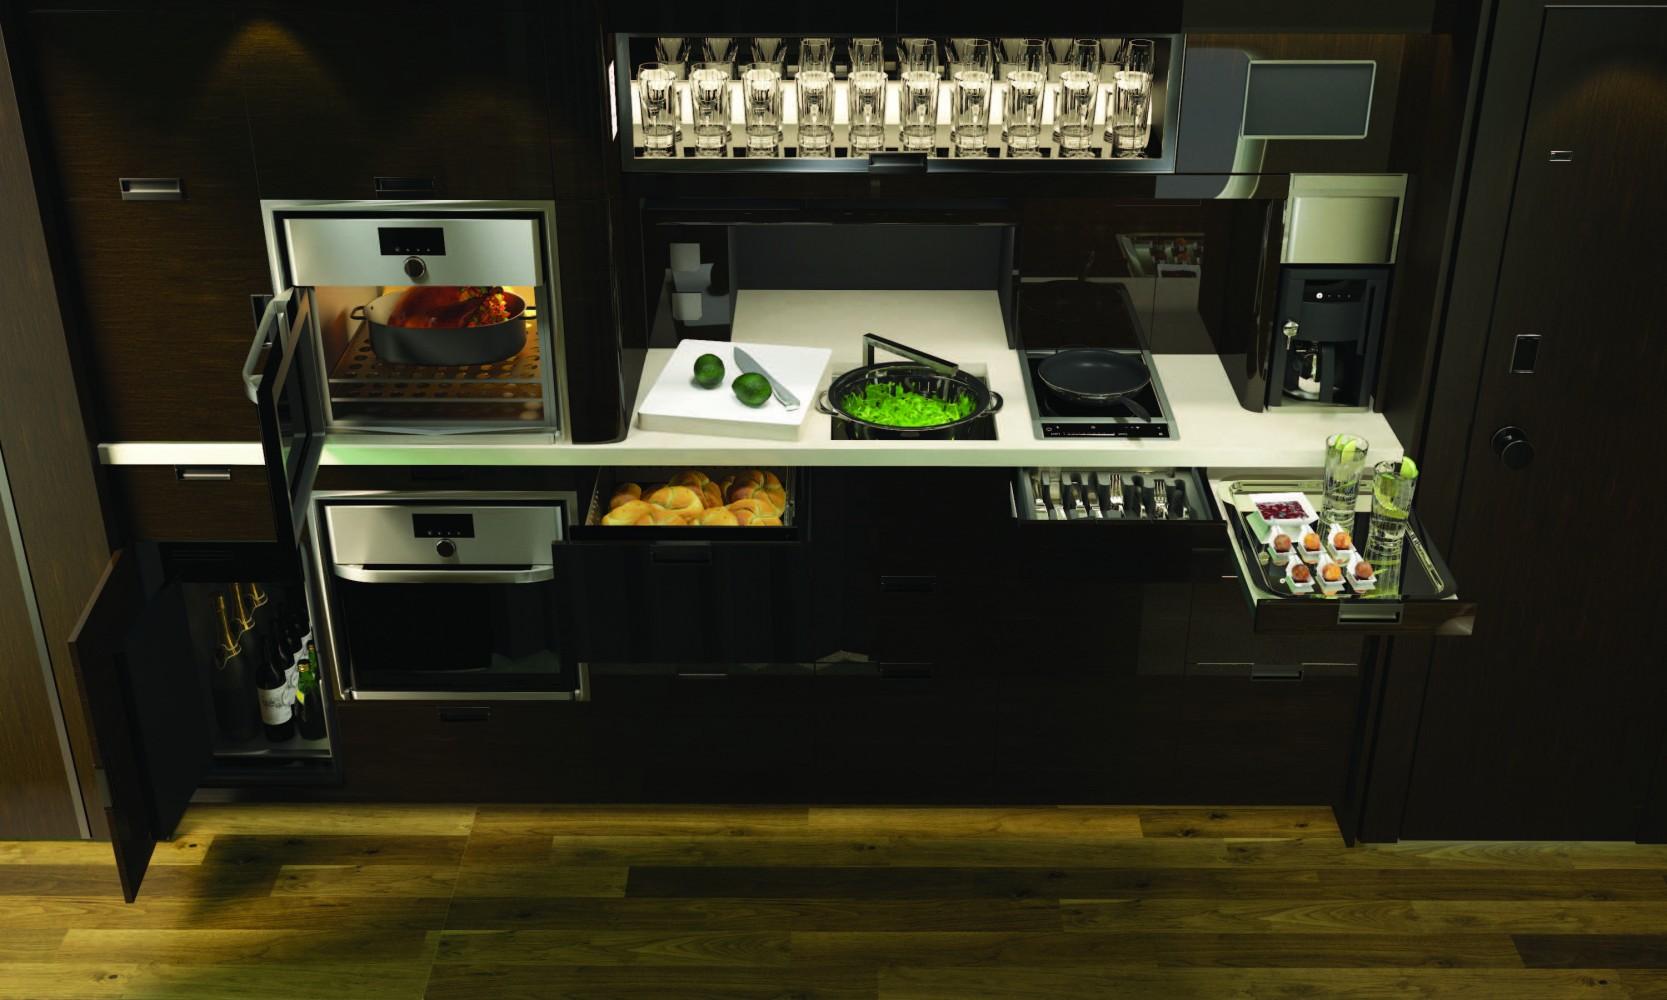 Global 7500 business jet kitchen storage